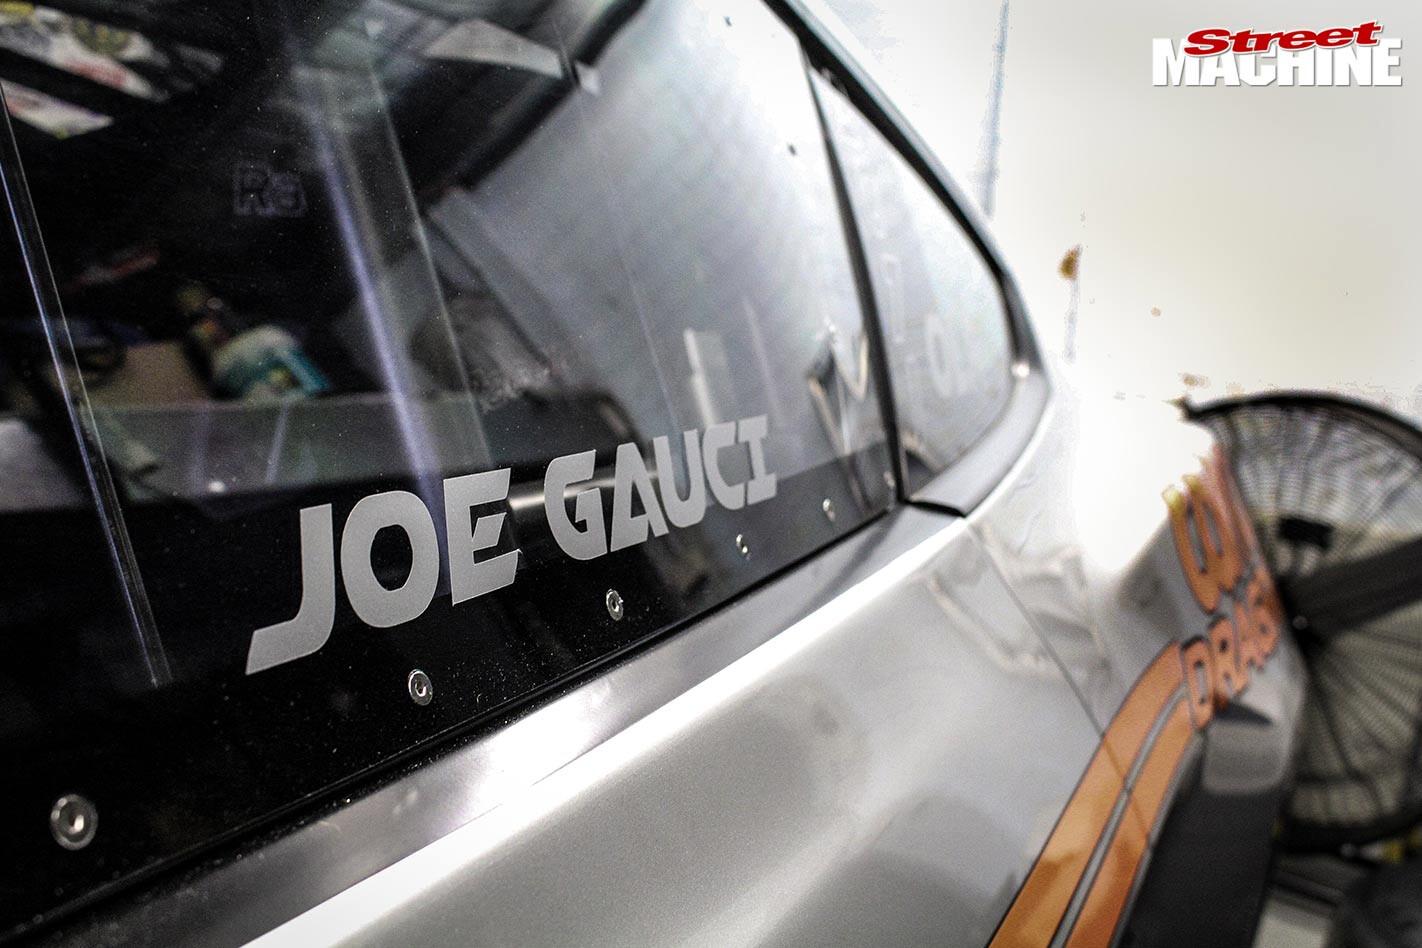 Joe Gauci's Ford Mustang